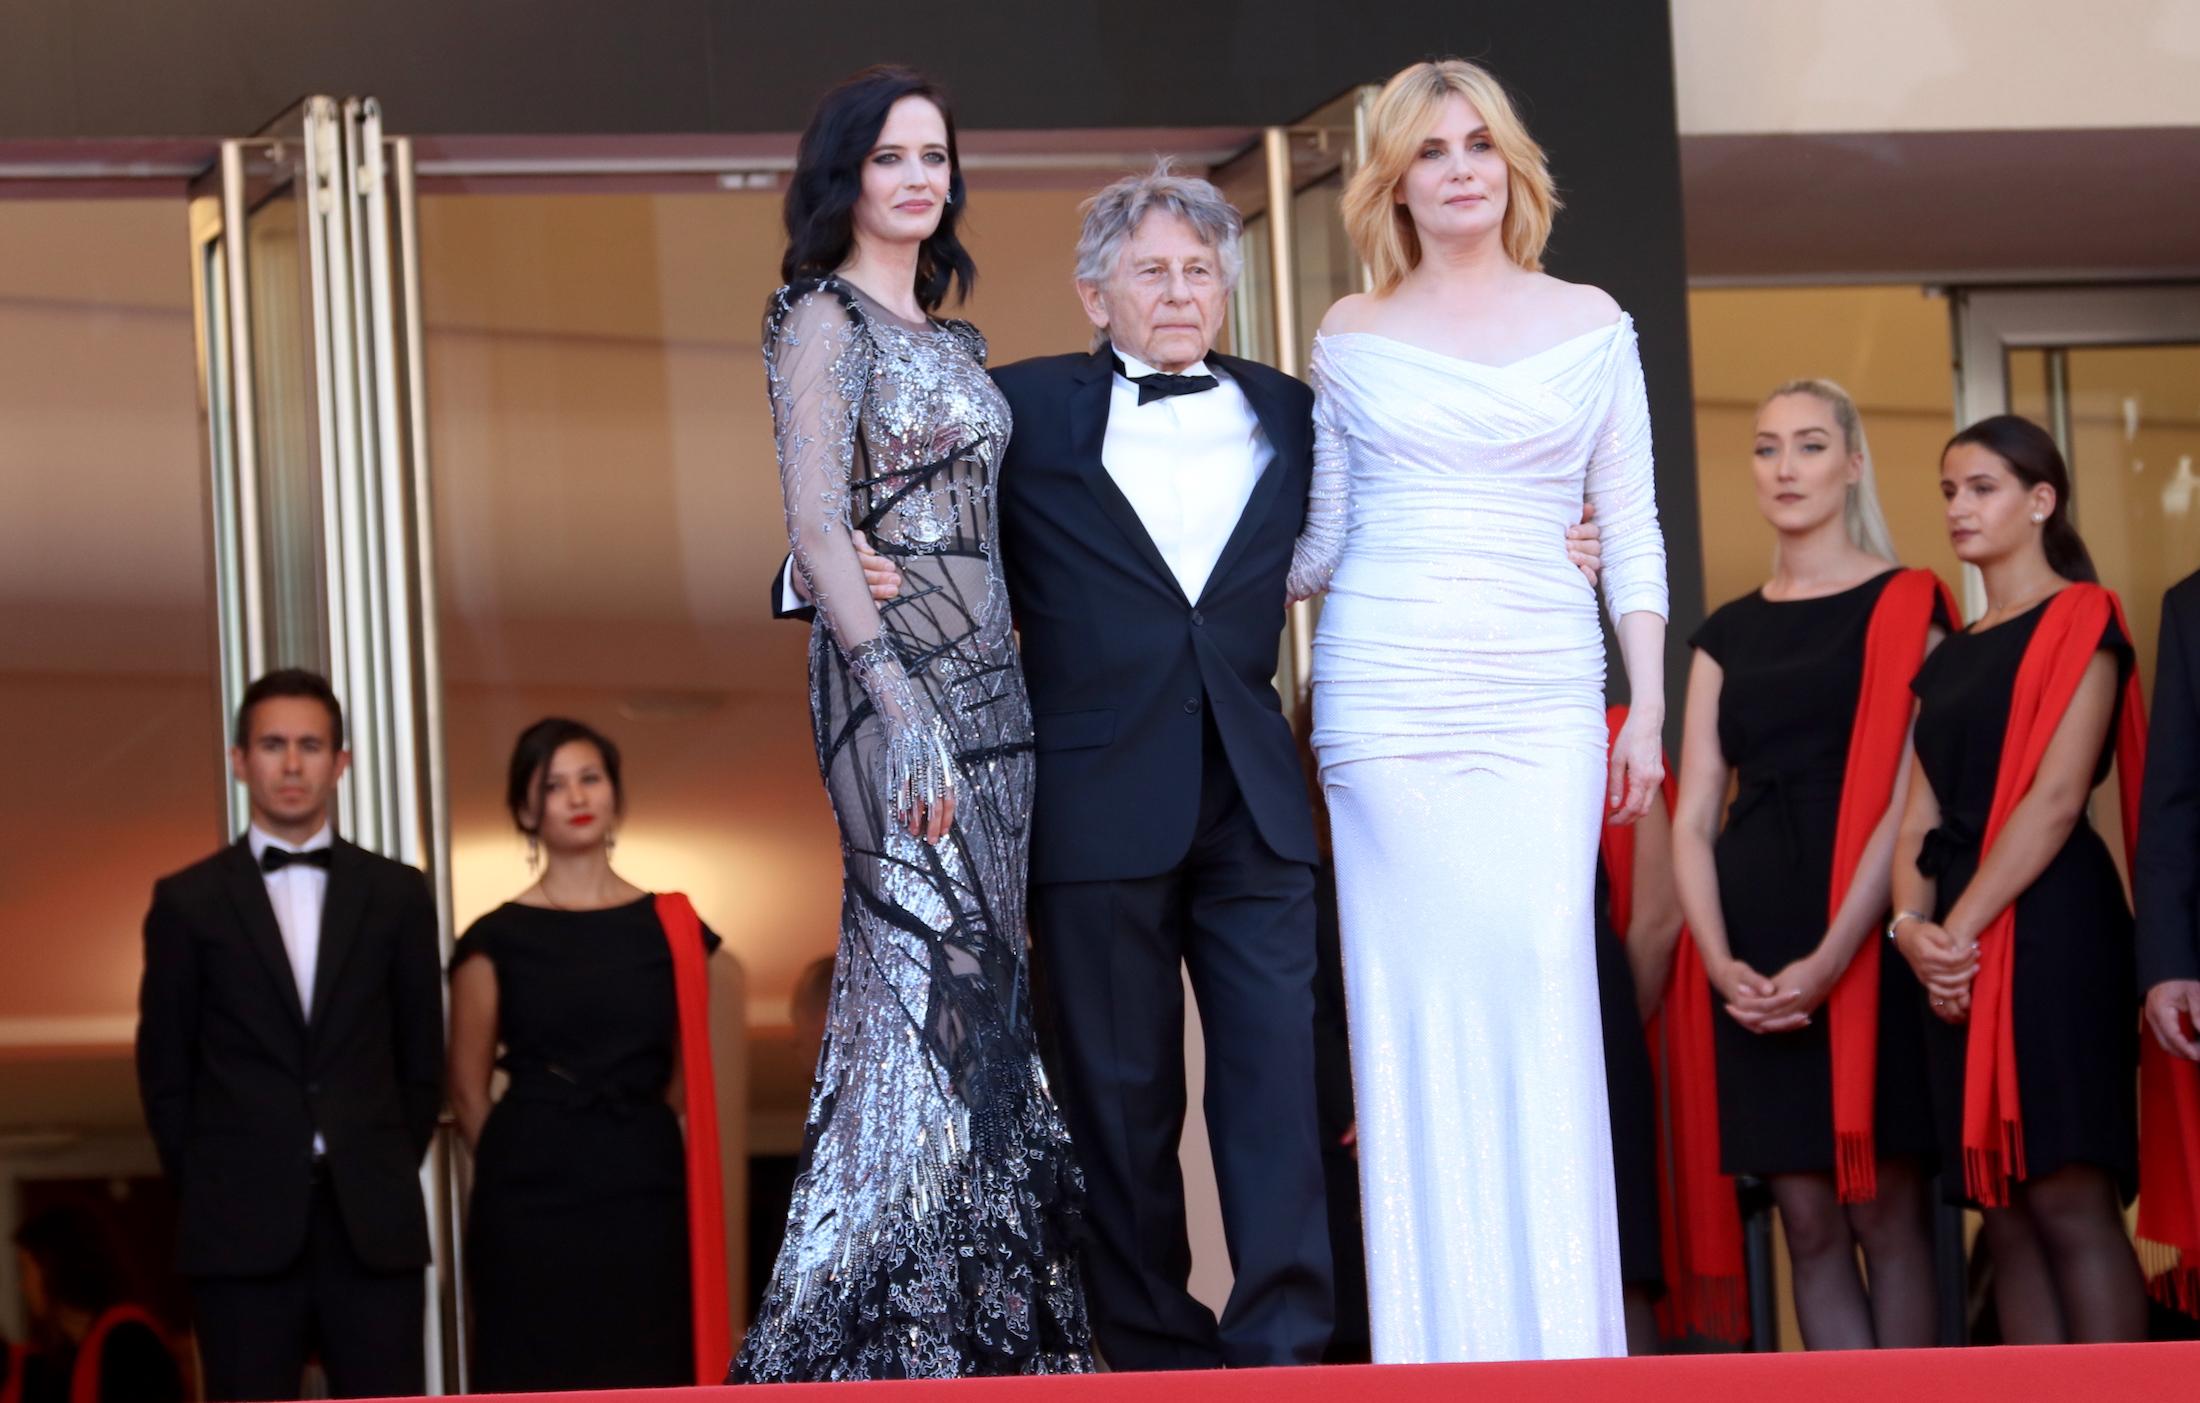 Cannes 2017: Eva Green, Emmanuelle Seigner e Roman Polanski sul red carpet di Based on a True Story